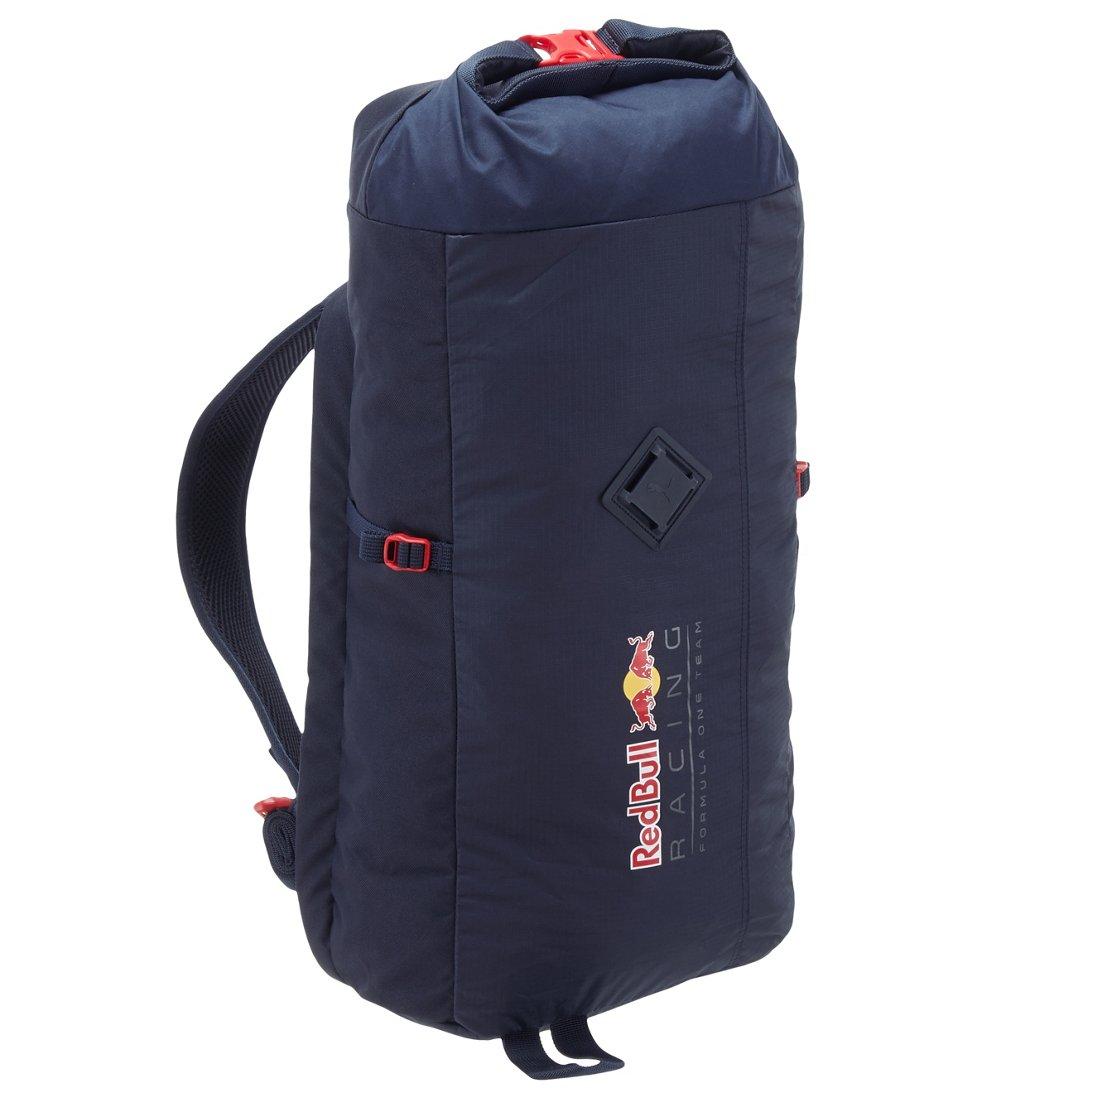 abf8269af6ec8 Puma Red Bull Racing Lifestyle Rucksack 54 cm - koffer-direkt.de